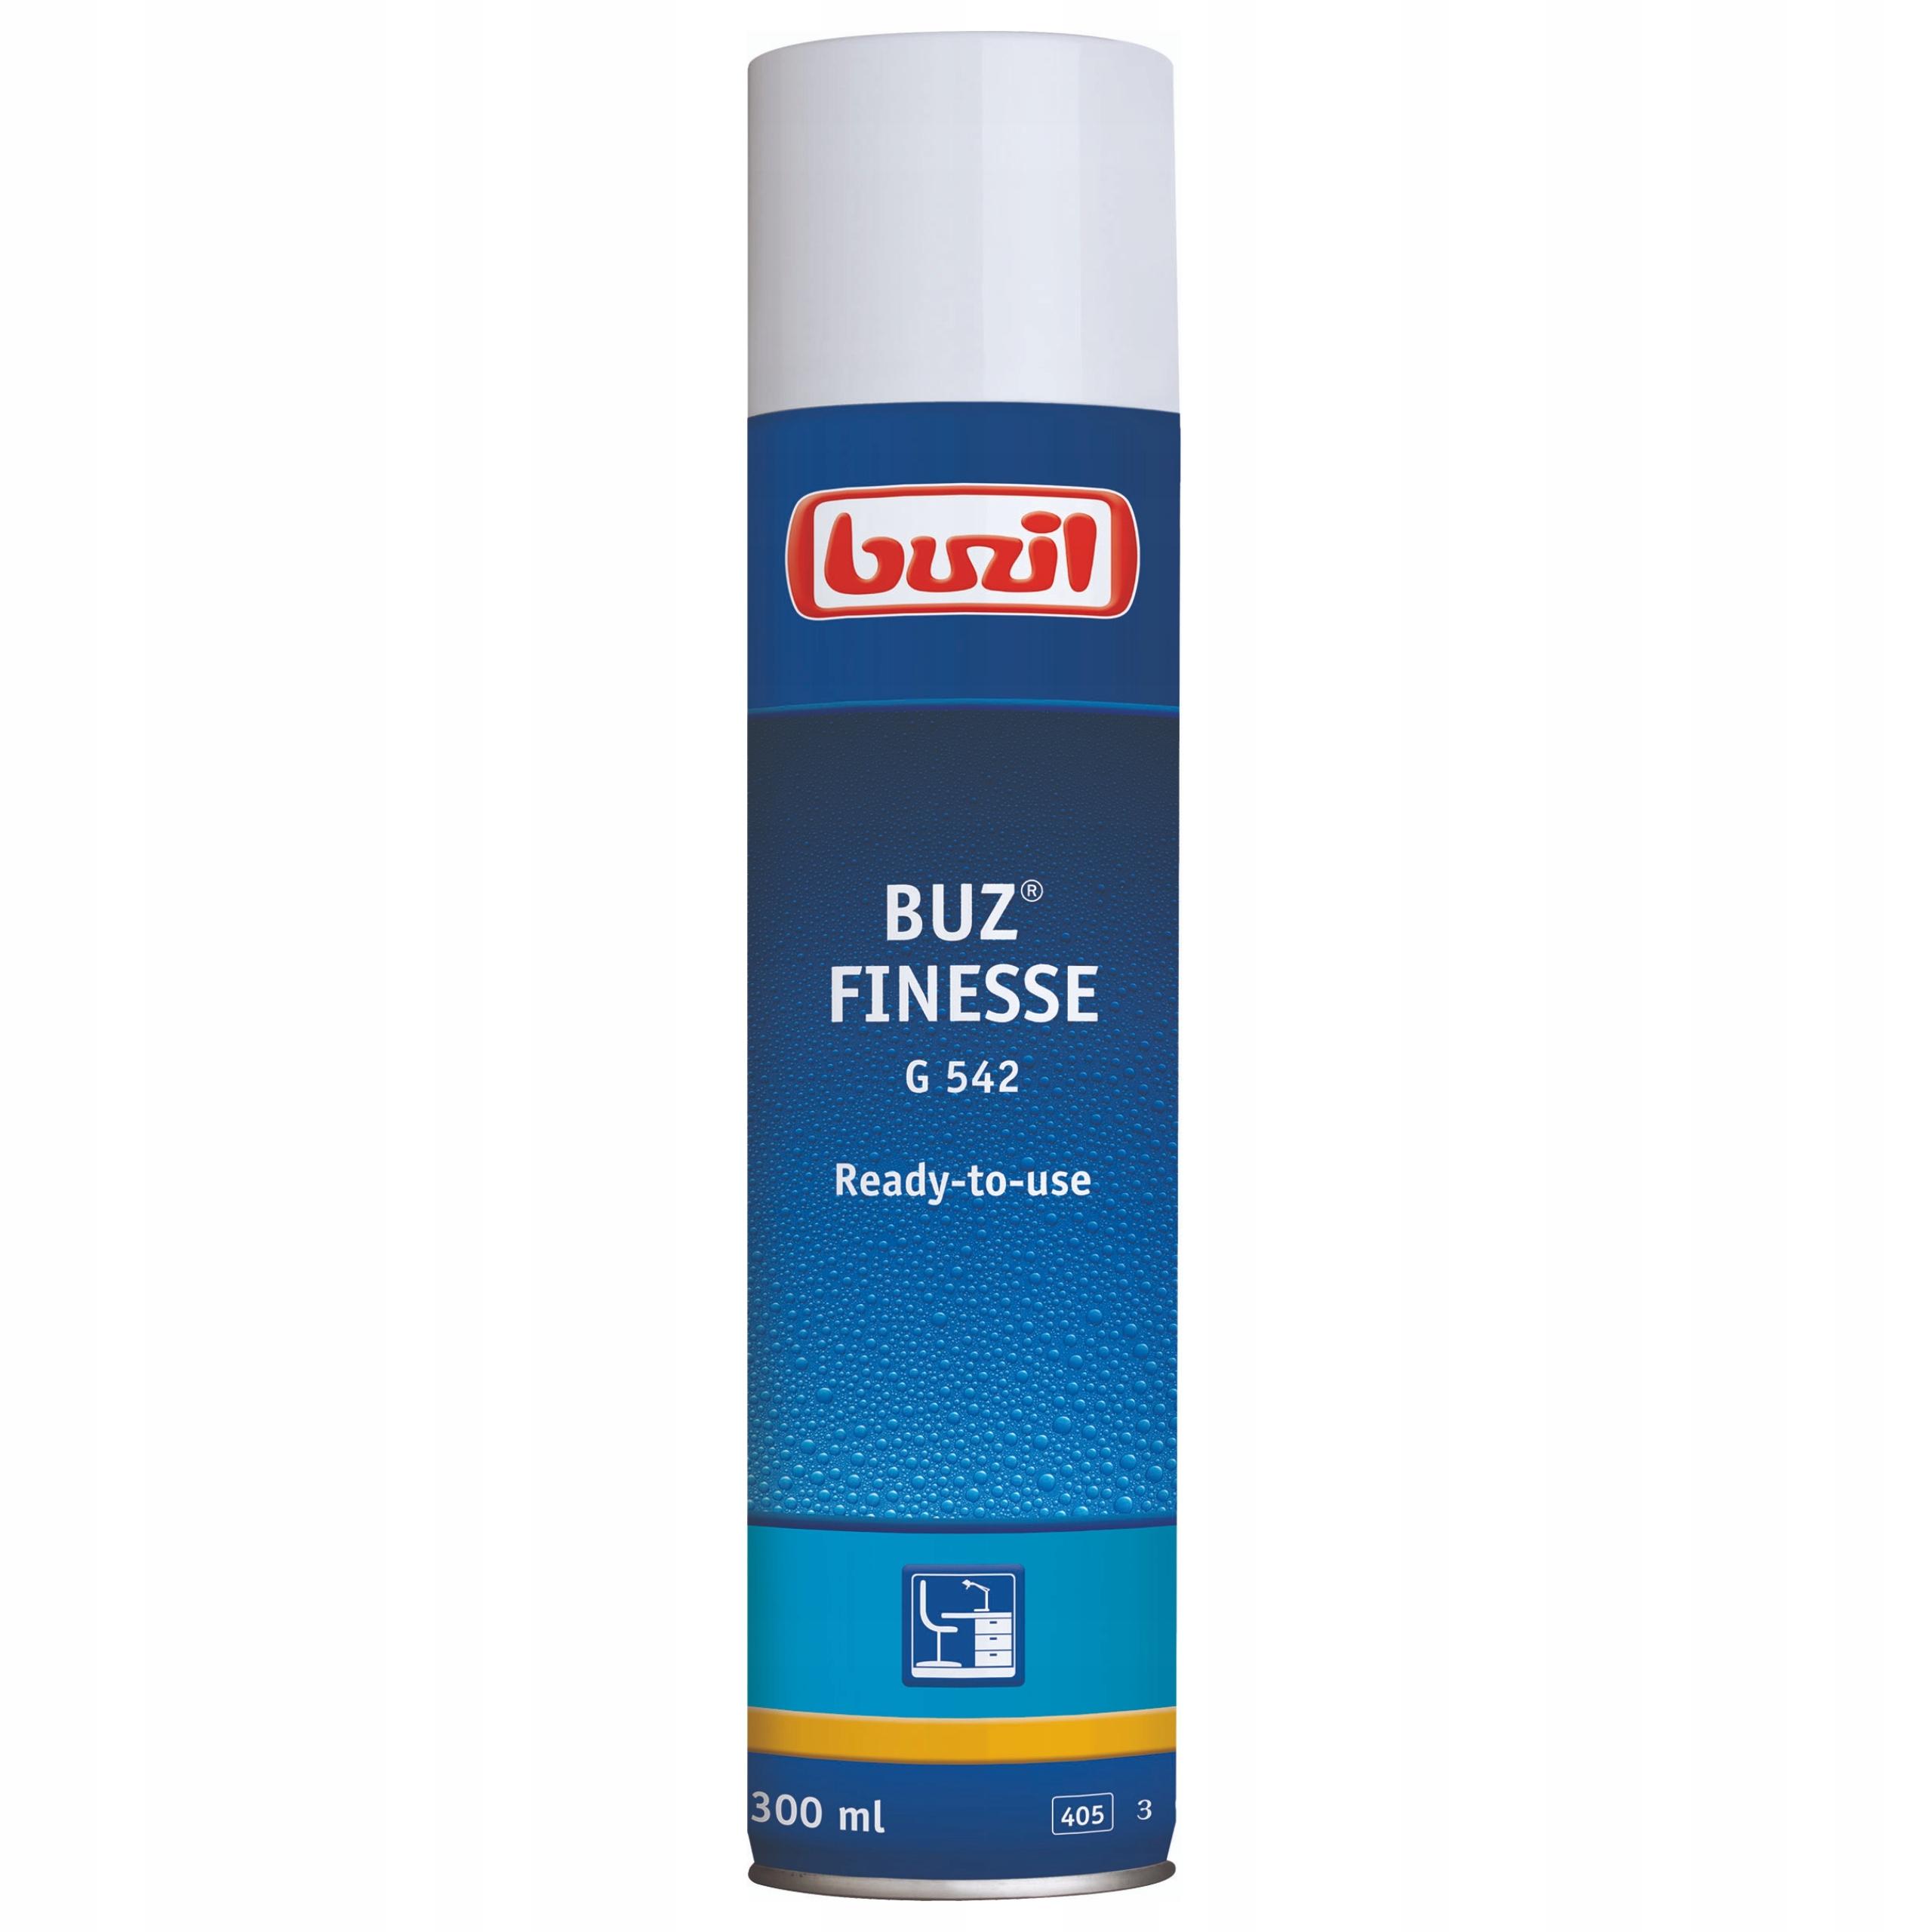 BUZIL BUZ FINESSE G542 300ML